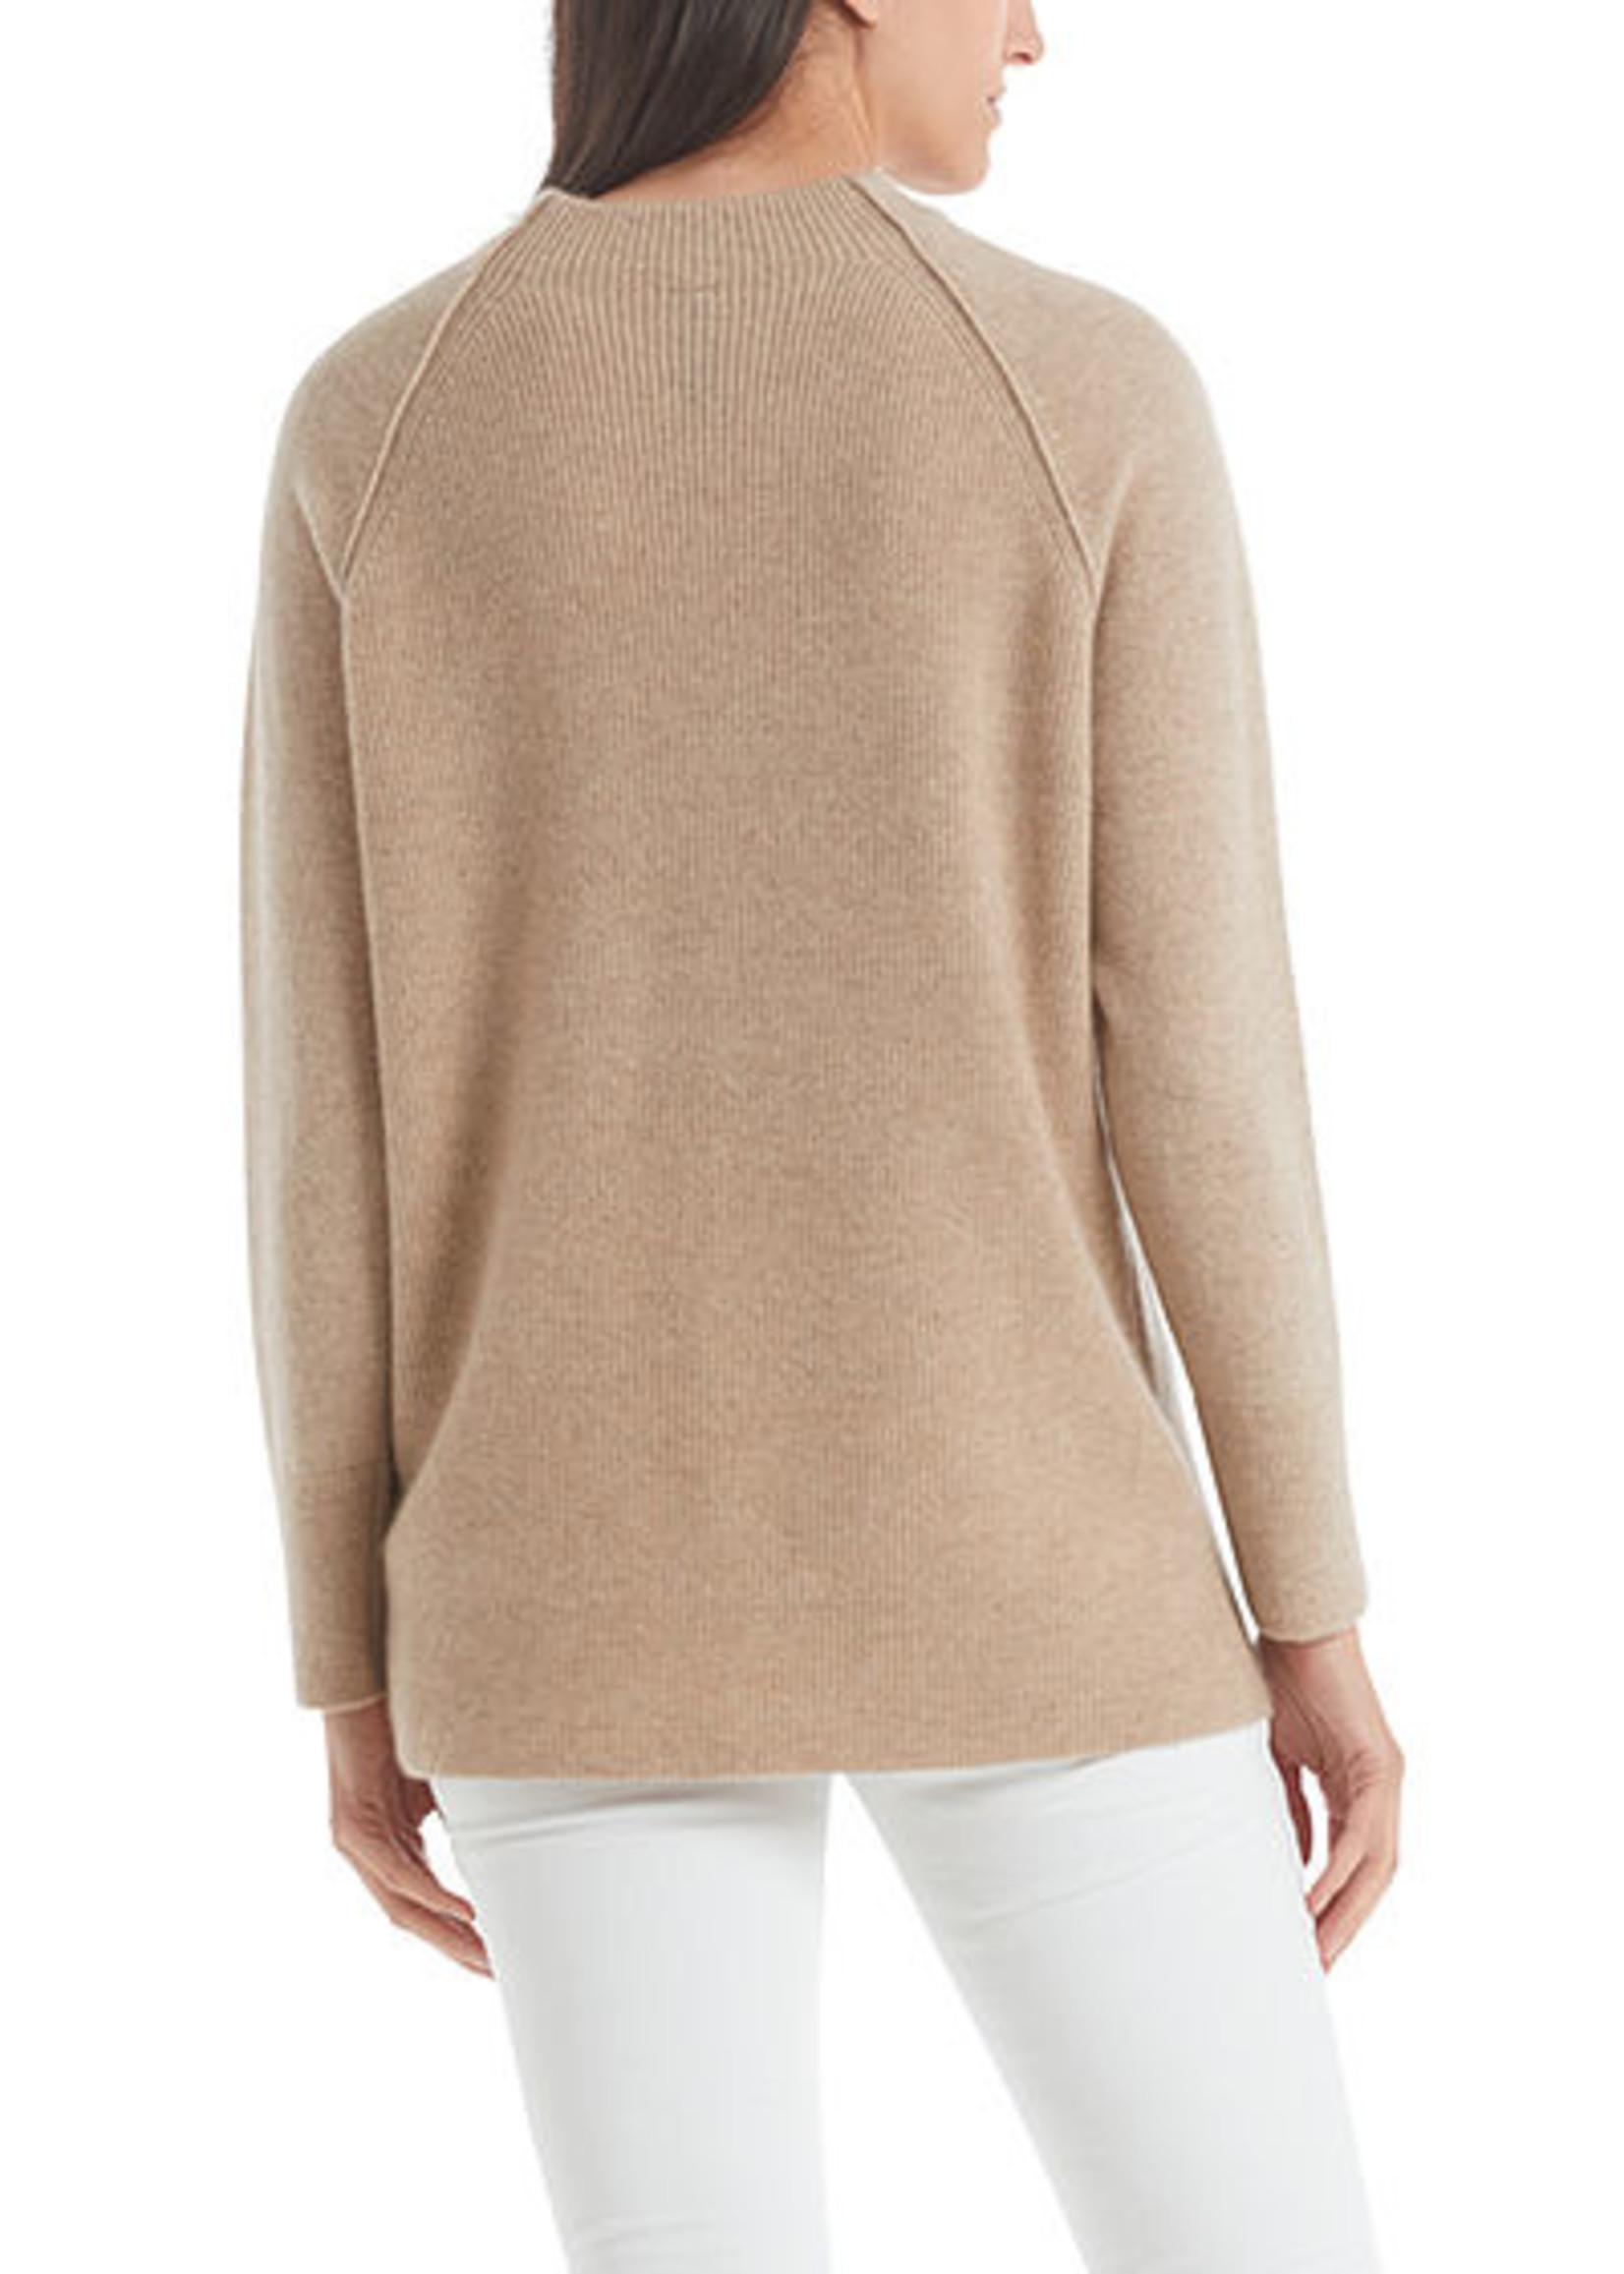 Sweater RA 41.09 M52 light stone